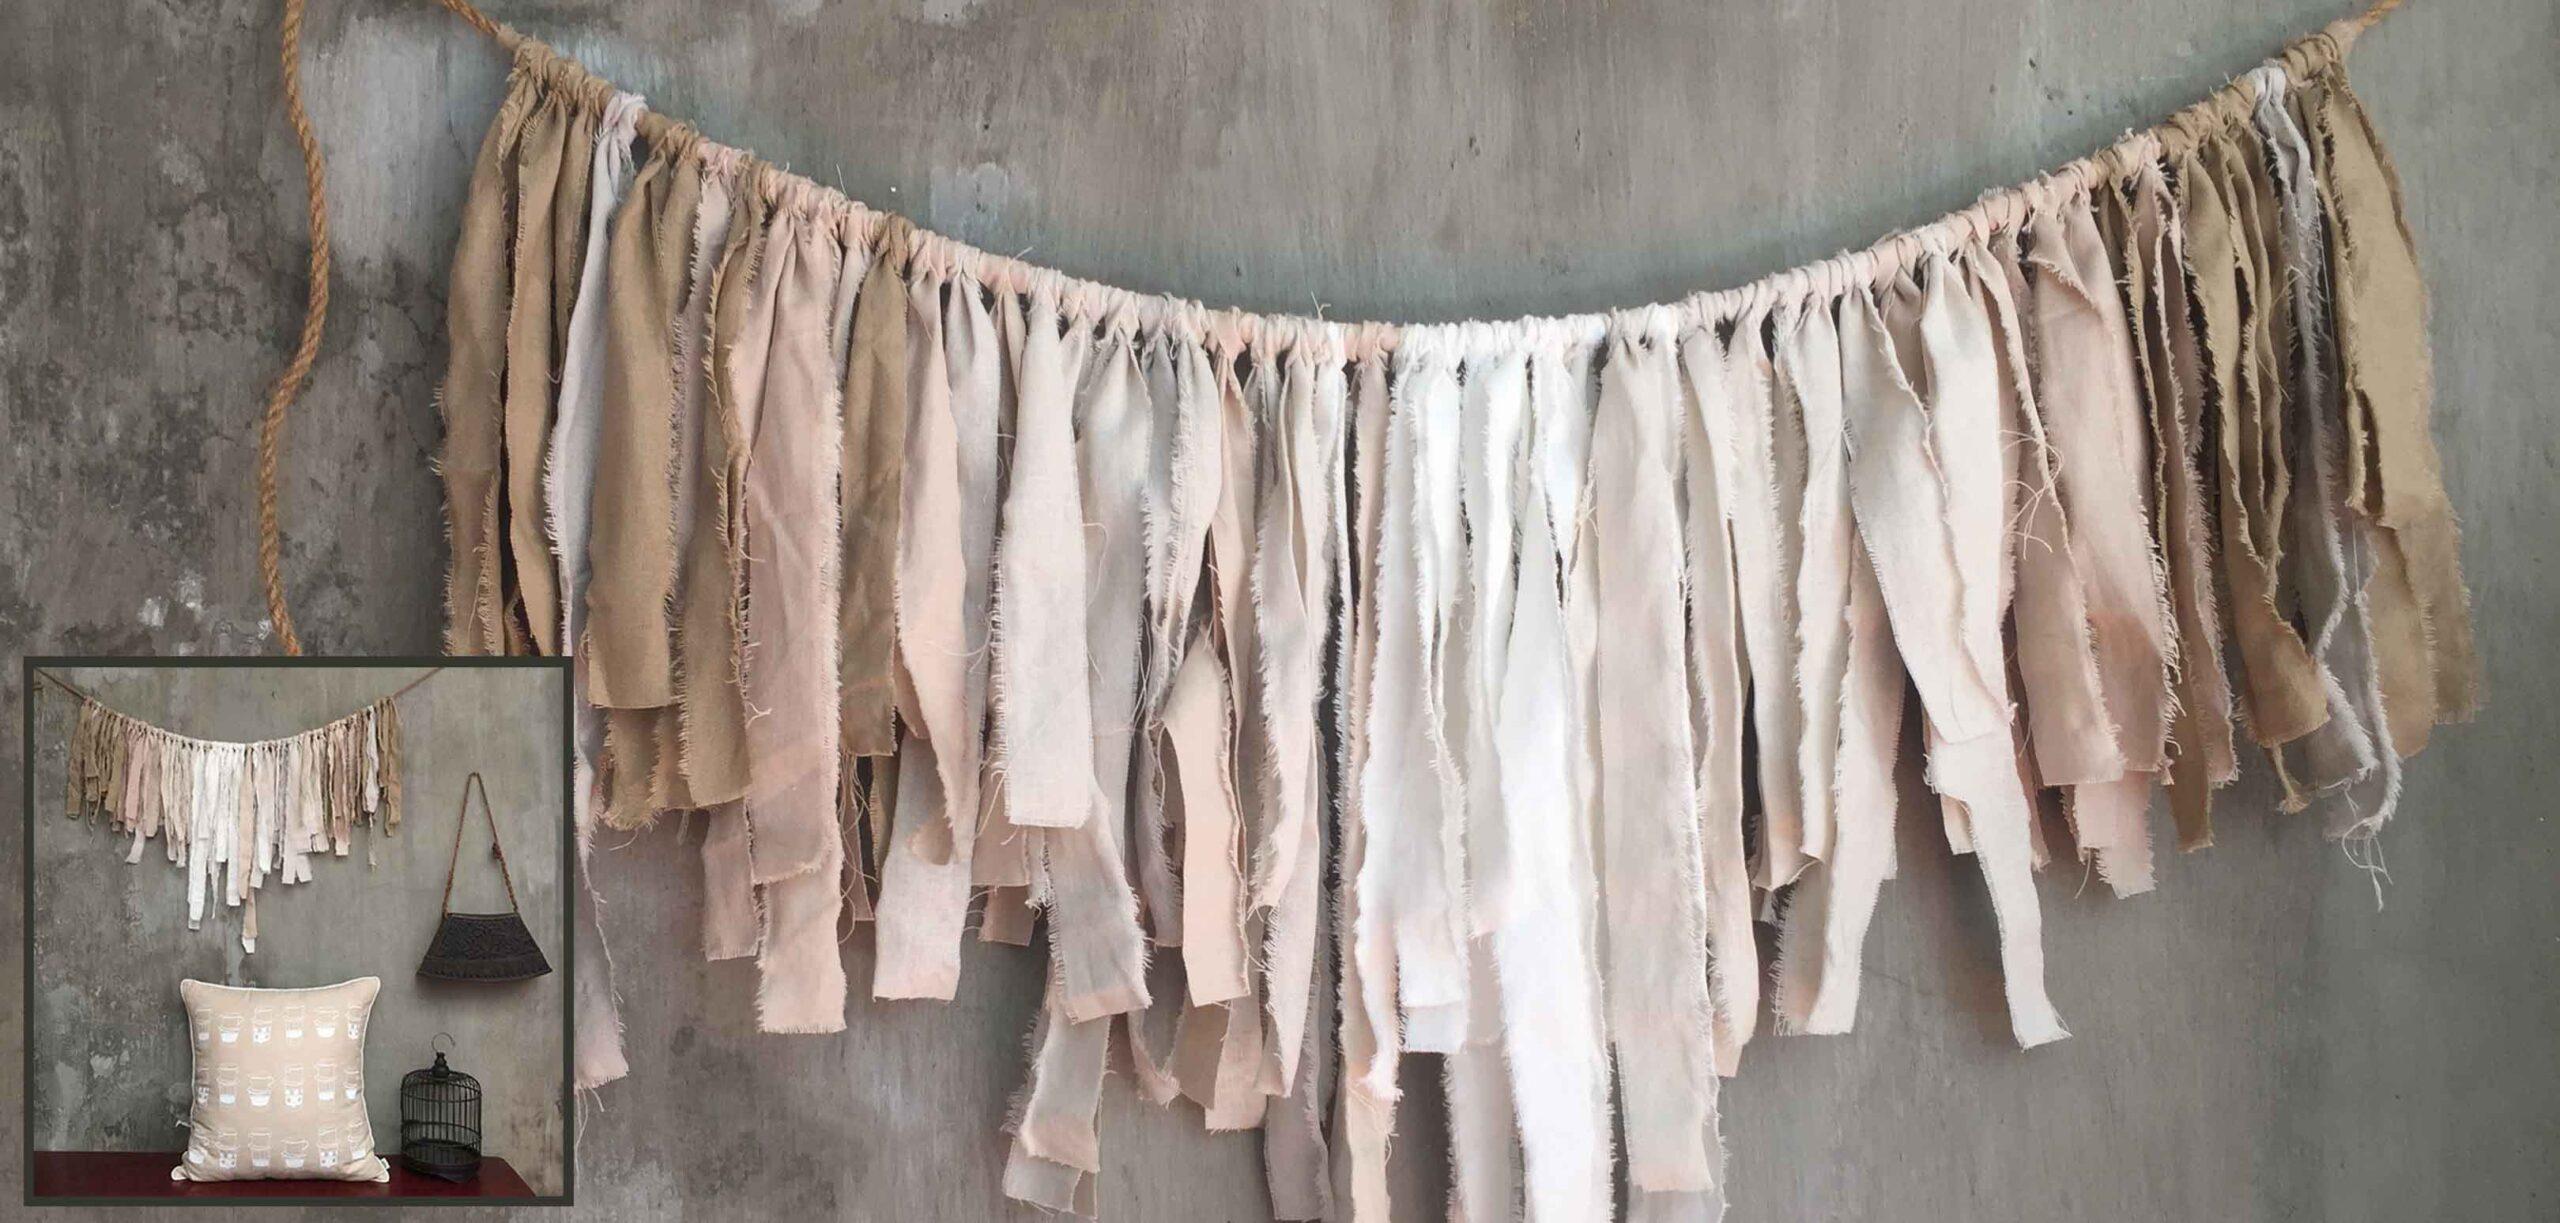 Fabric garland